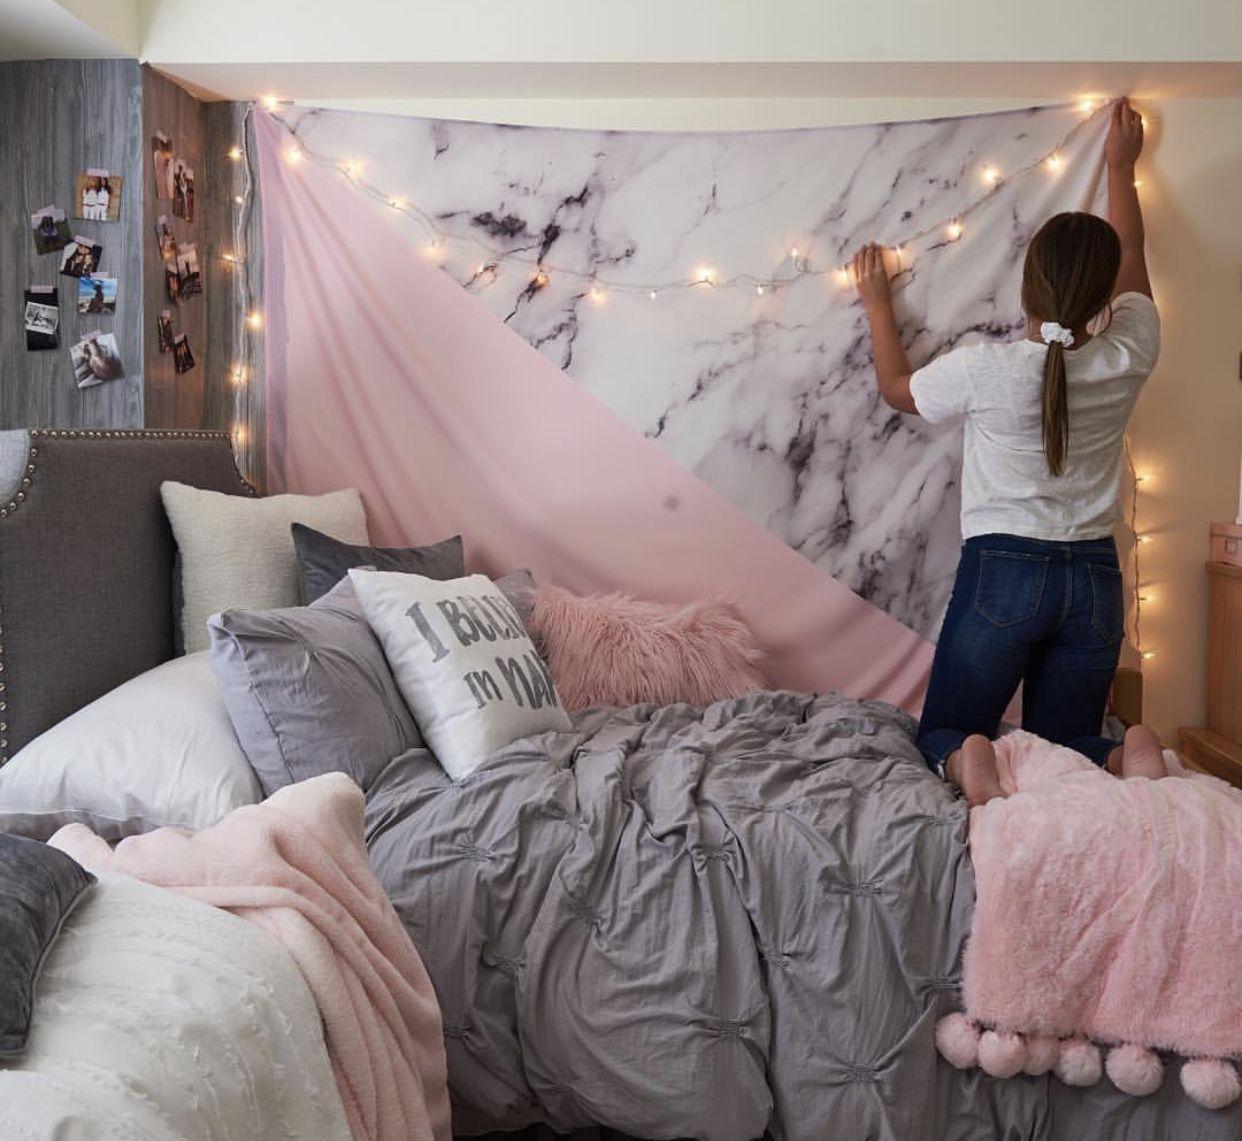 Pin By Mia Simoes On Apartment Ideas Dorm Room Inspiration Dorm Room Designs Dorm Room Essentials